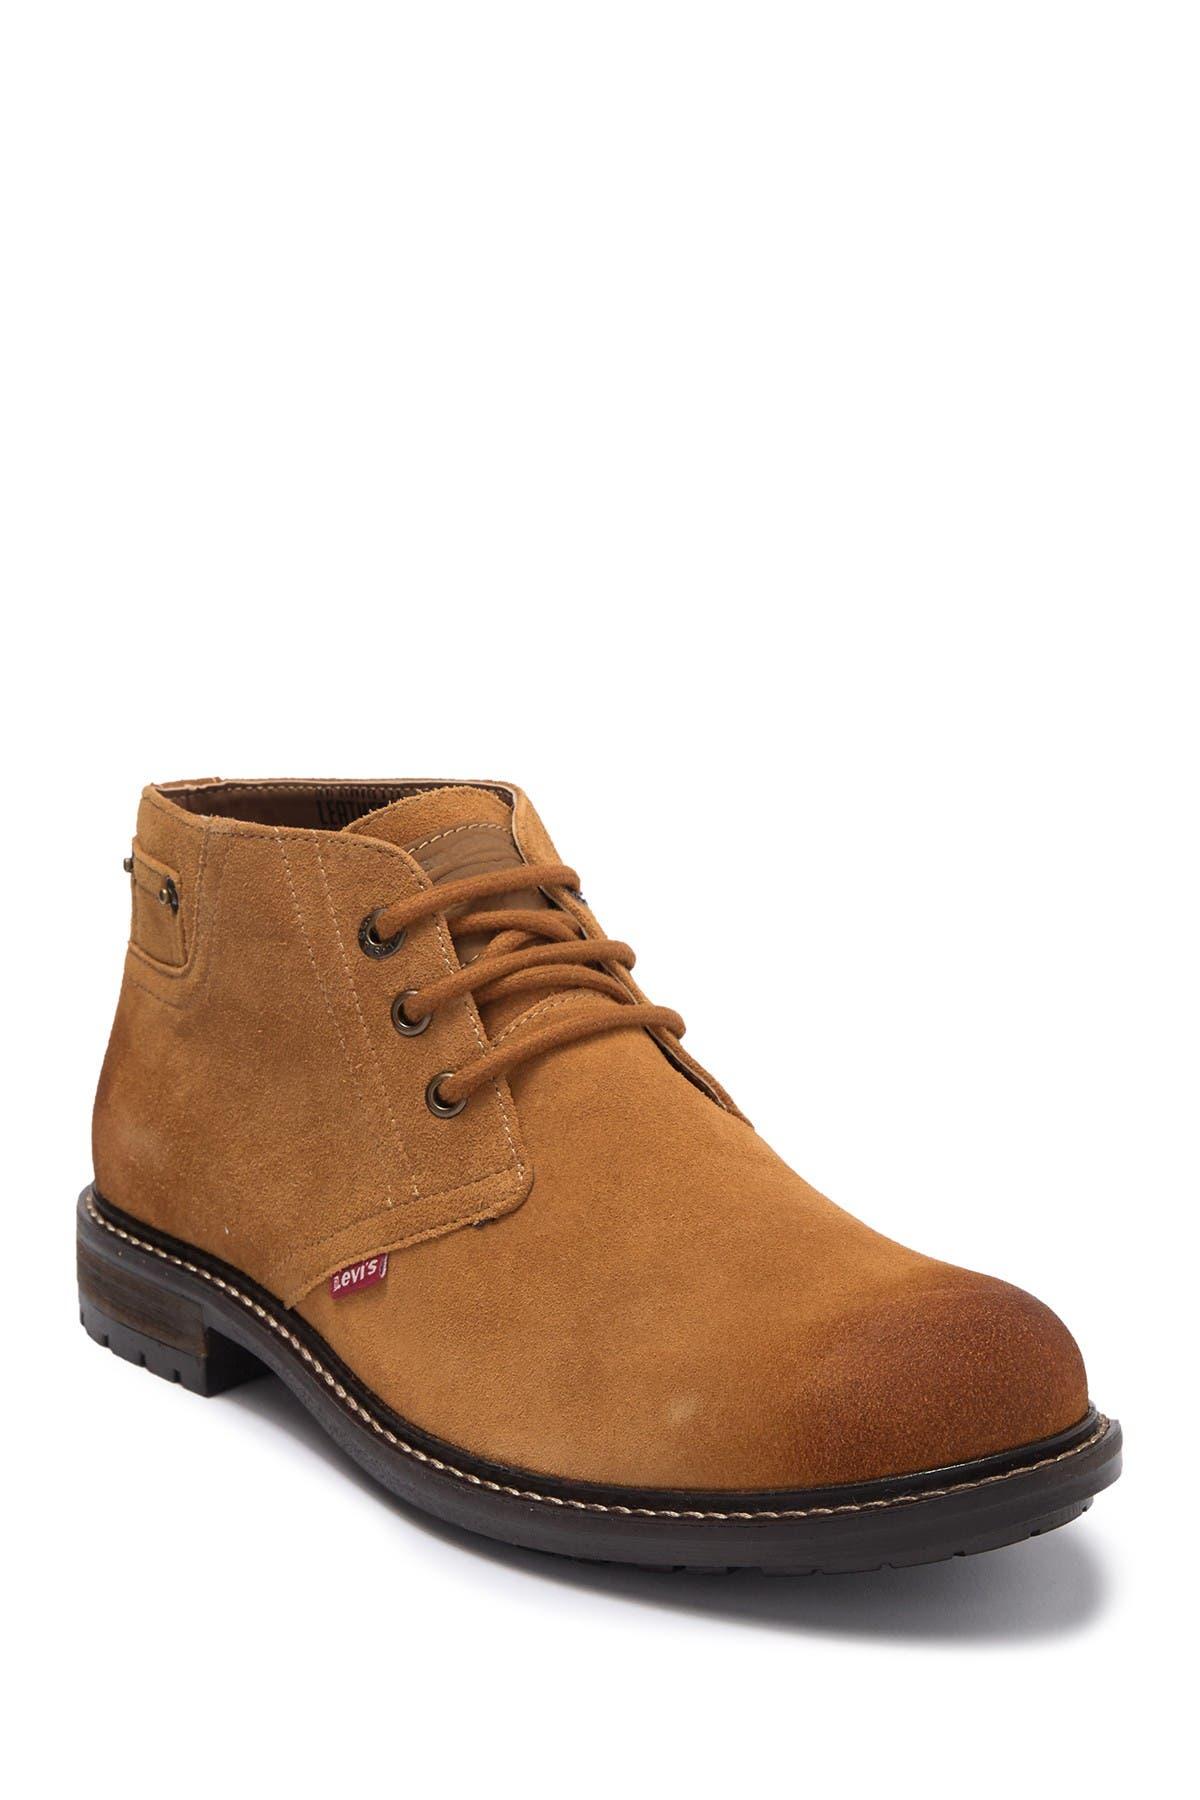 Levi's | Cambridge Suede Chukka Boot